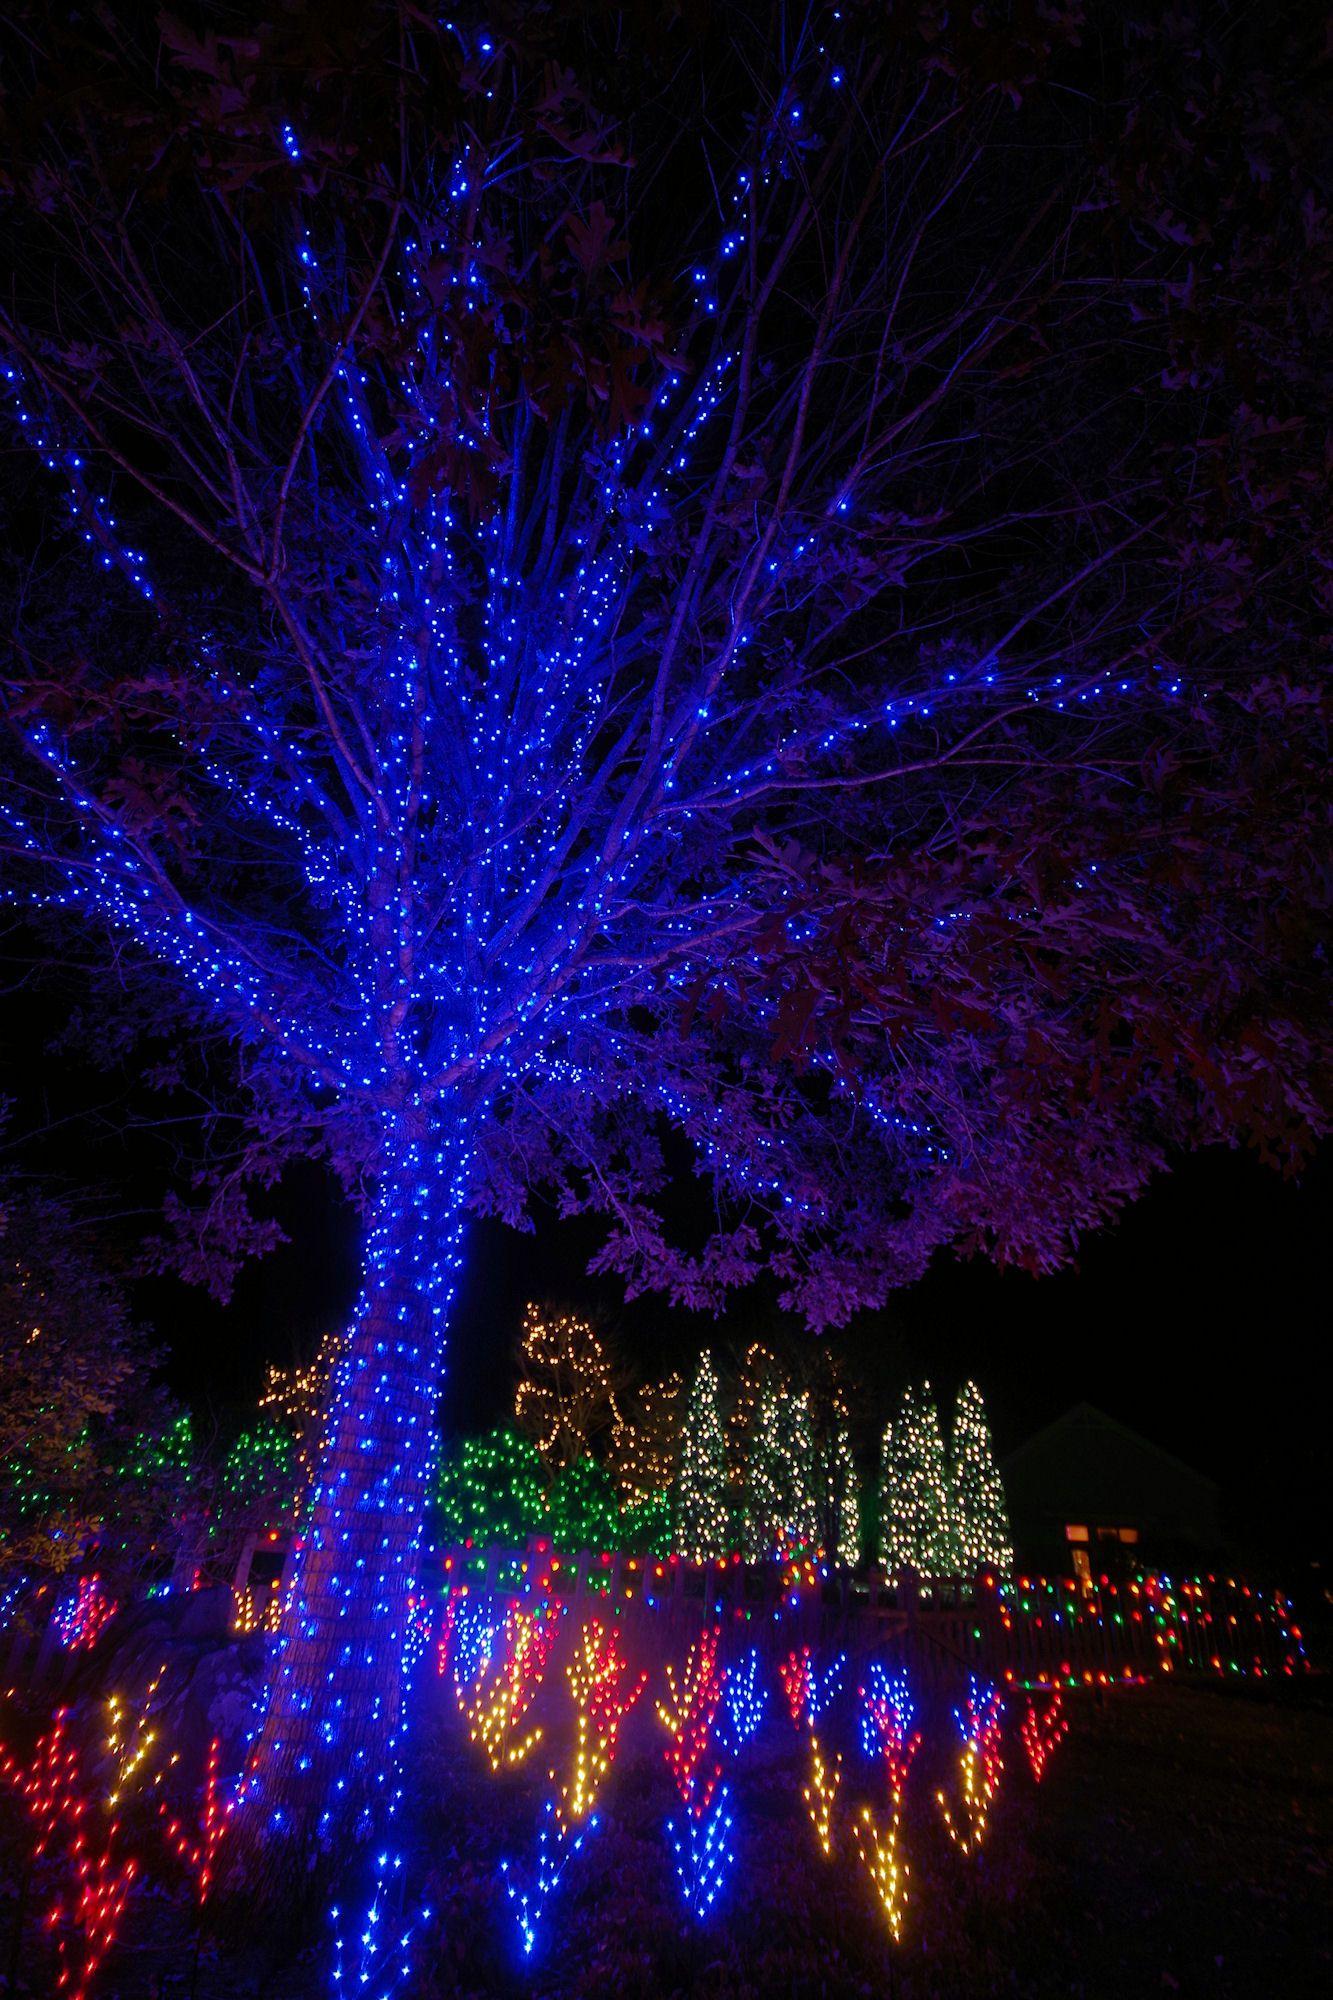 Winter Lights at North Carolina Arboretum in Asheville | Christmas ...